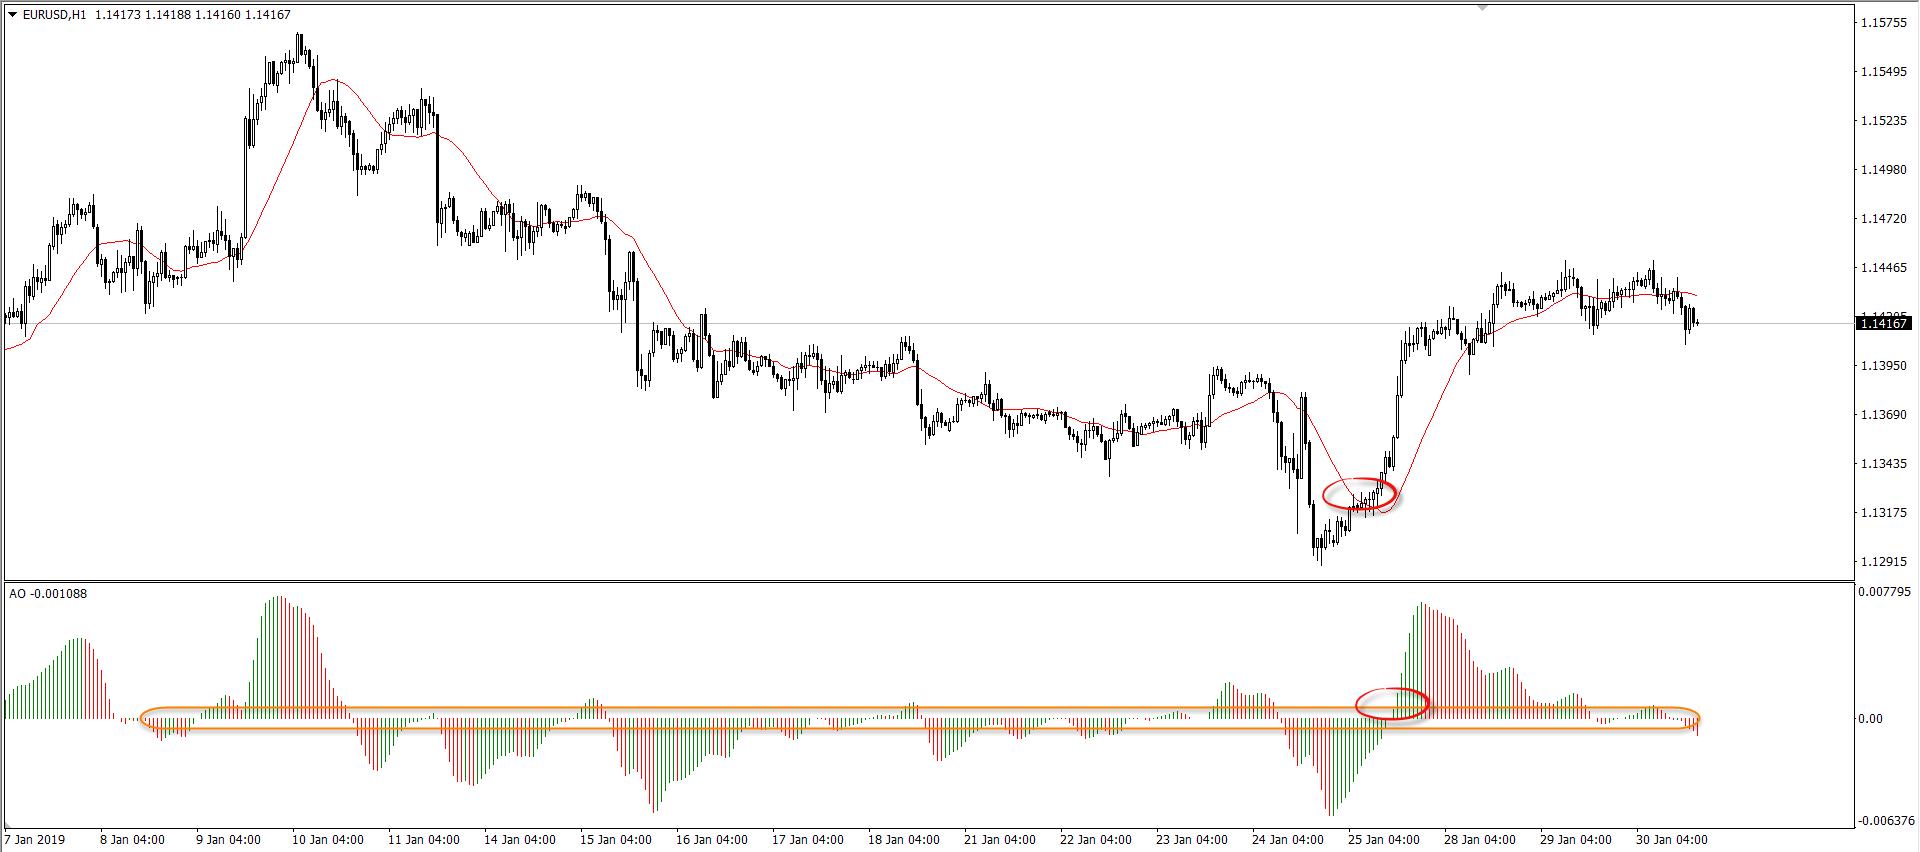 Measure Market Momentum Using the Awesome Oscillator 7